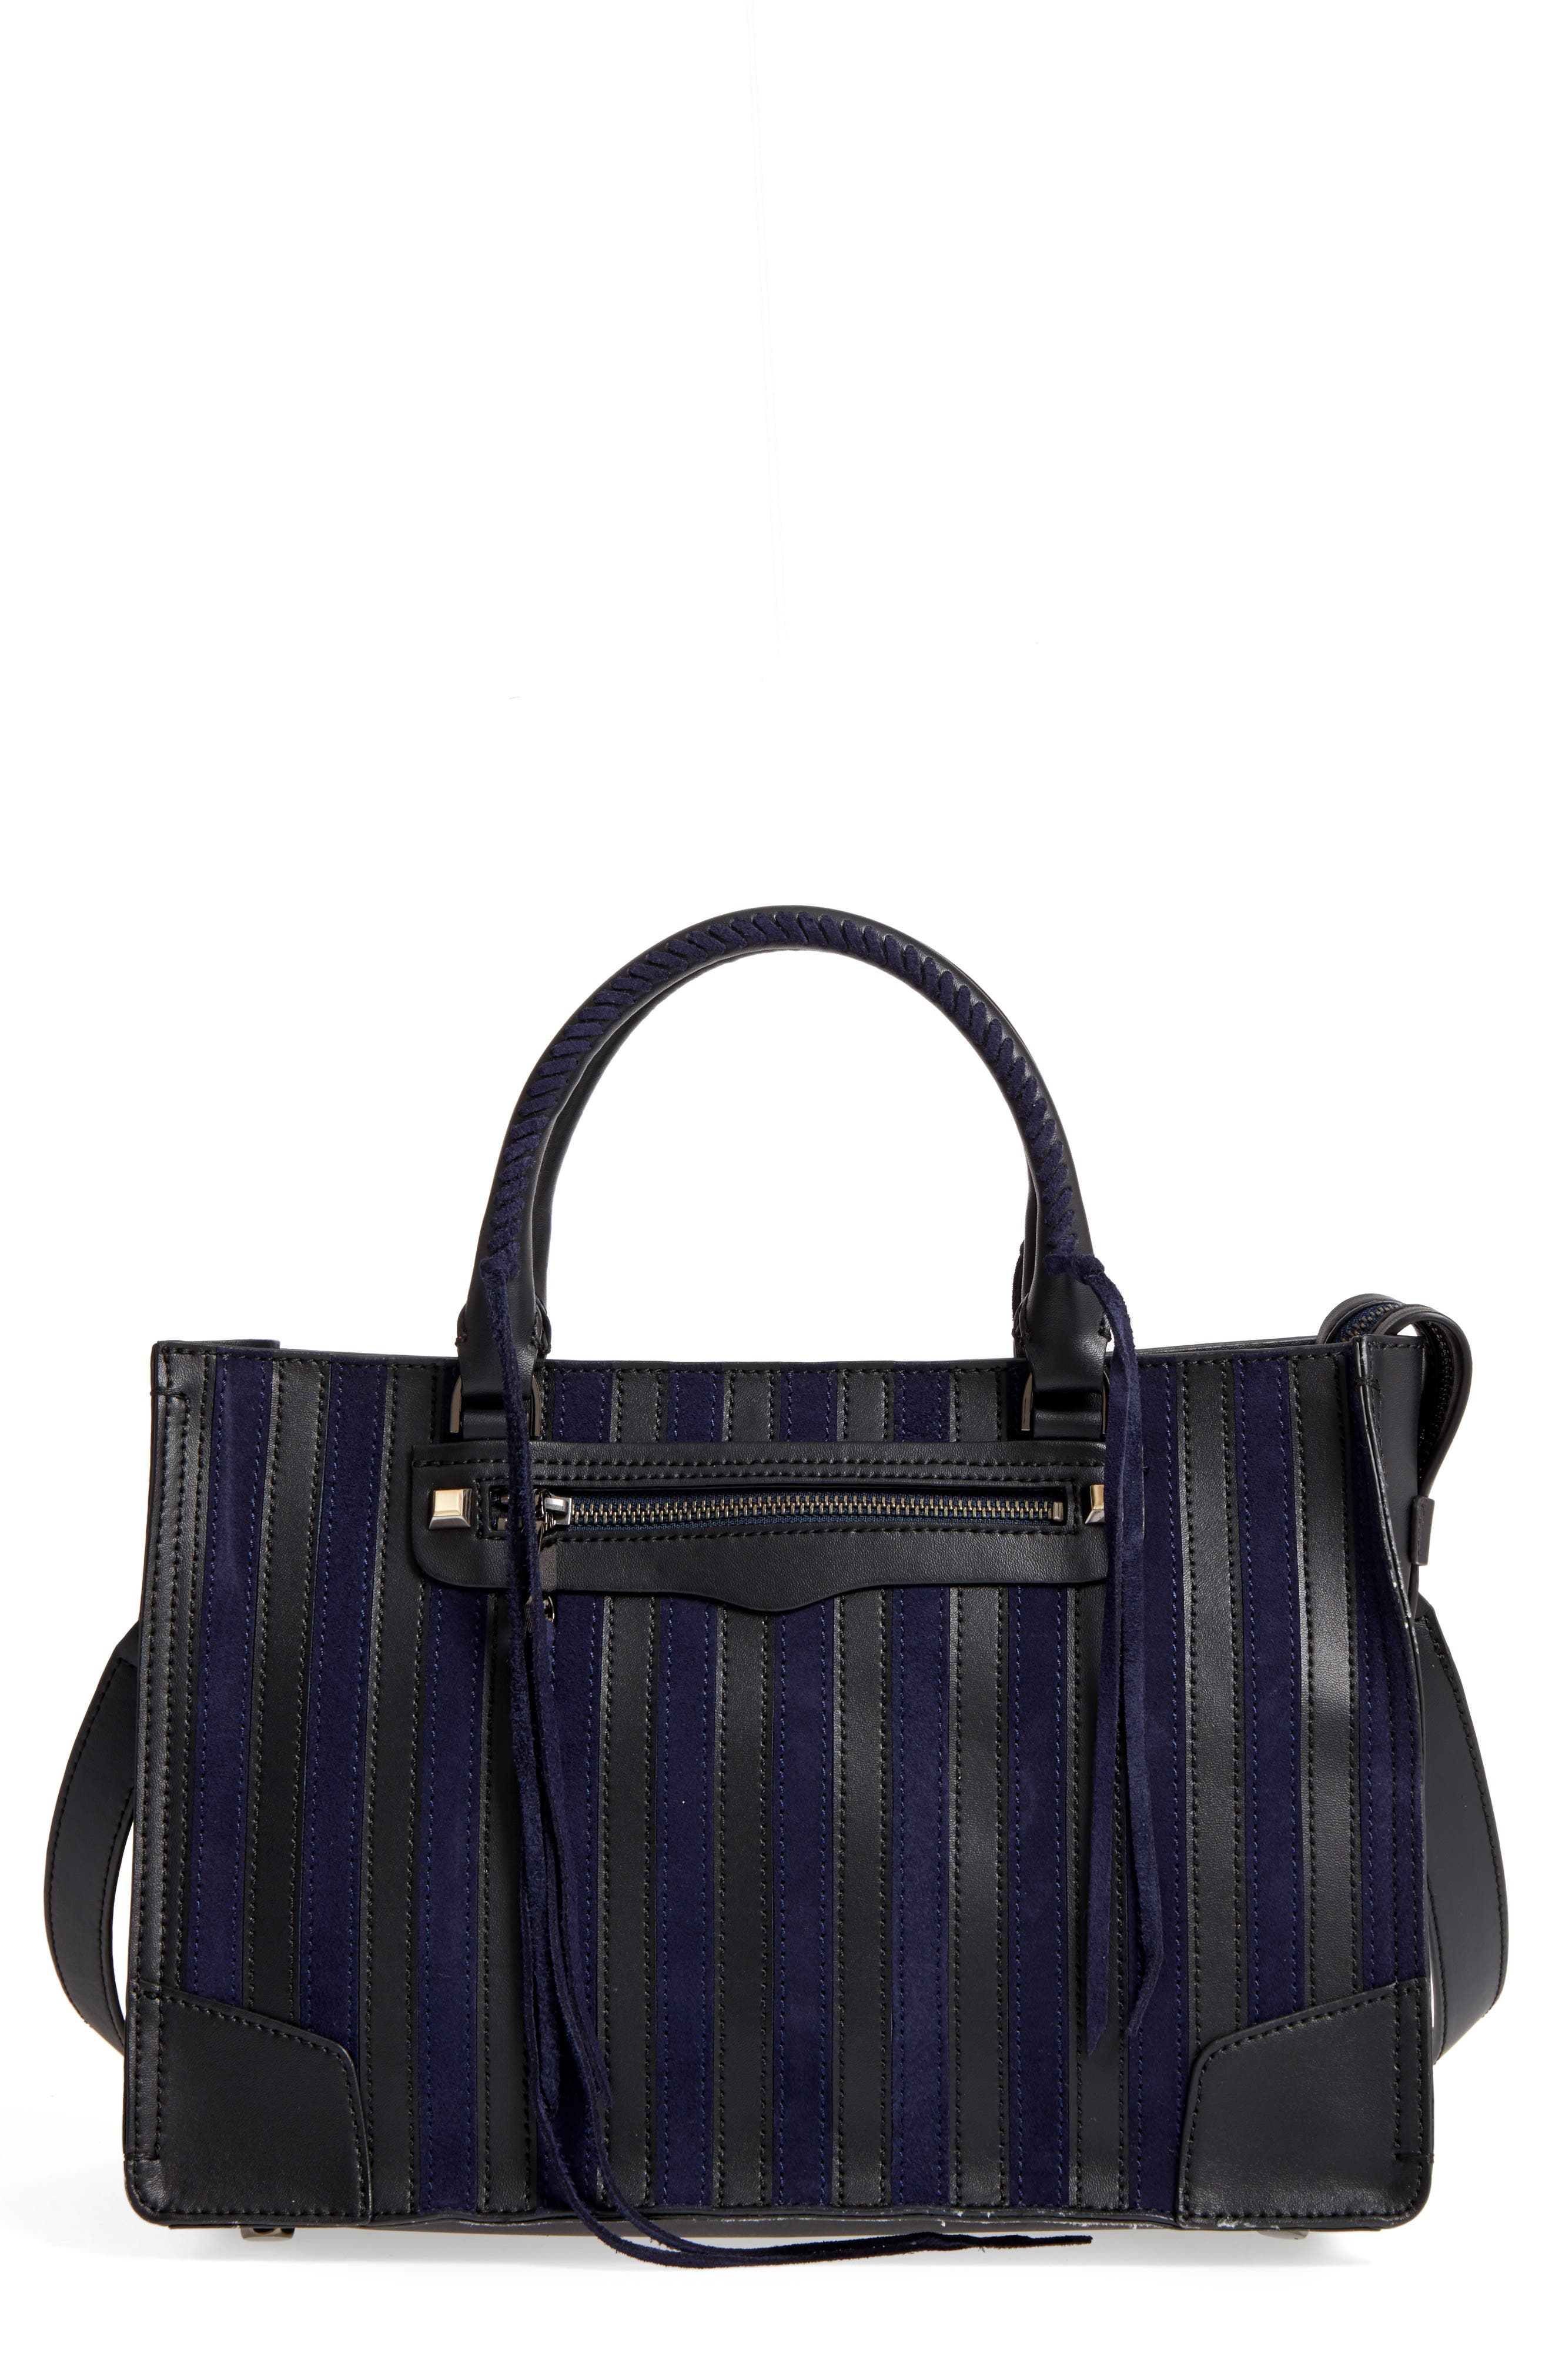 Main Image - Rebecca Minkoff Regan Stripe Leather & Suede Top Handle Satchel